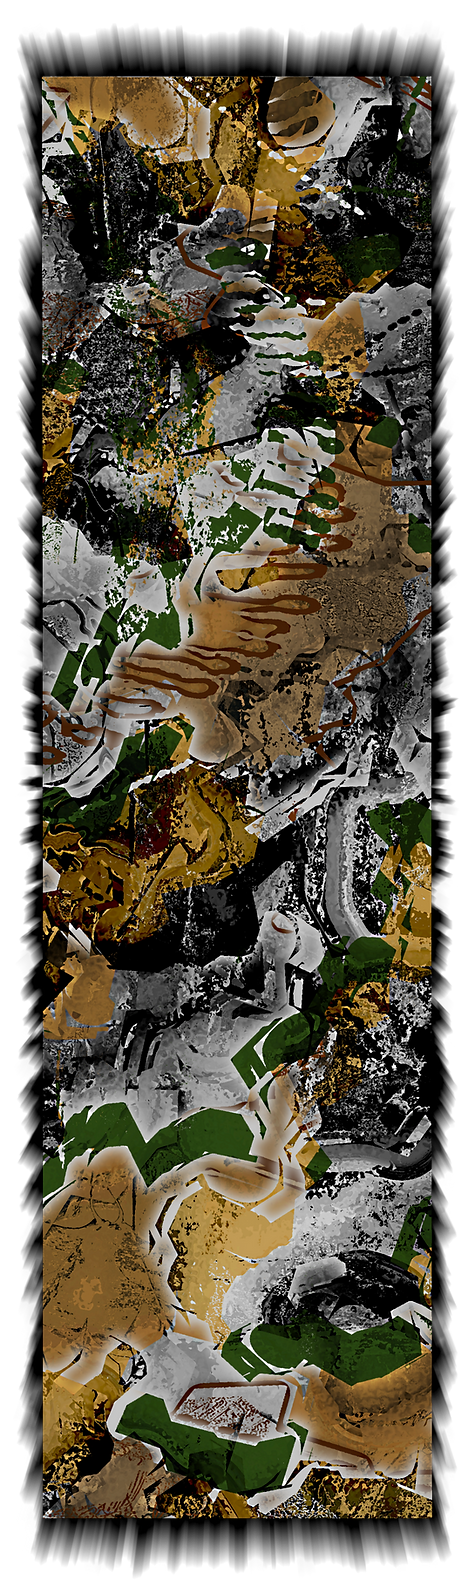 Revenant Camo Camouflage Left.png